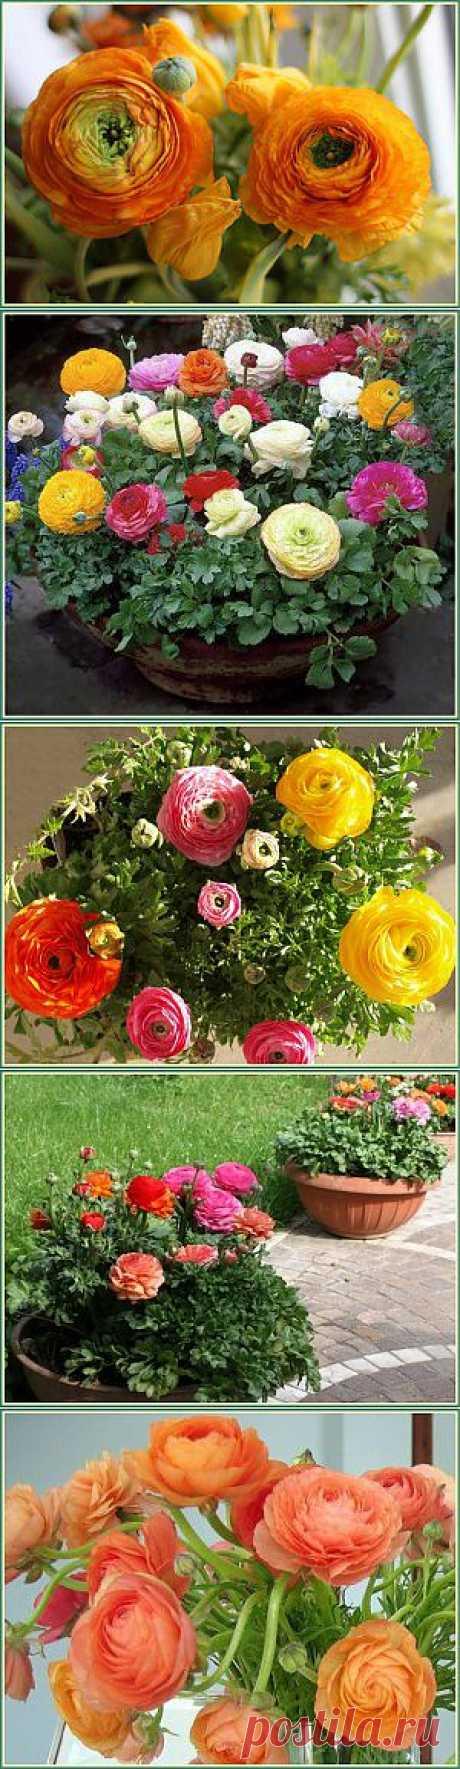 Ранункулюс  | Дачная жизнь - сад, огород, дача